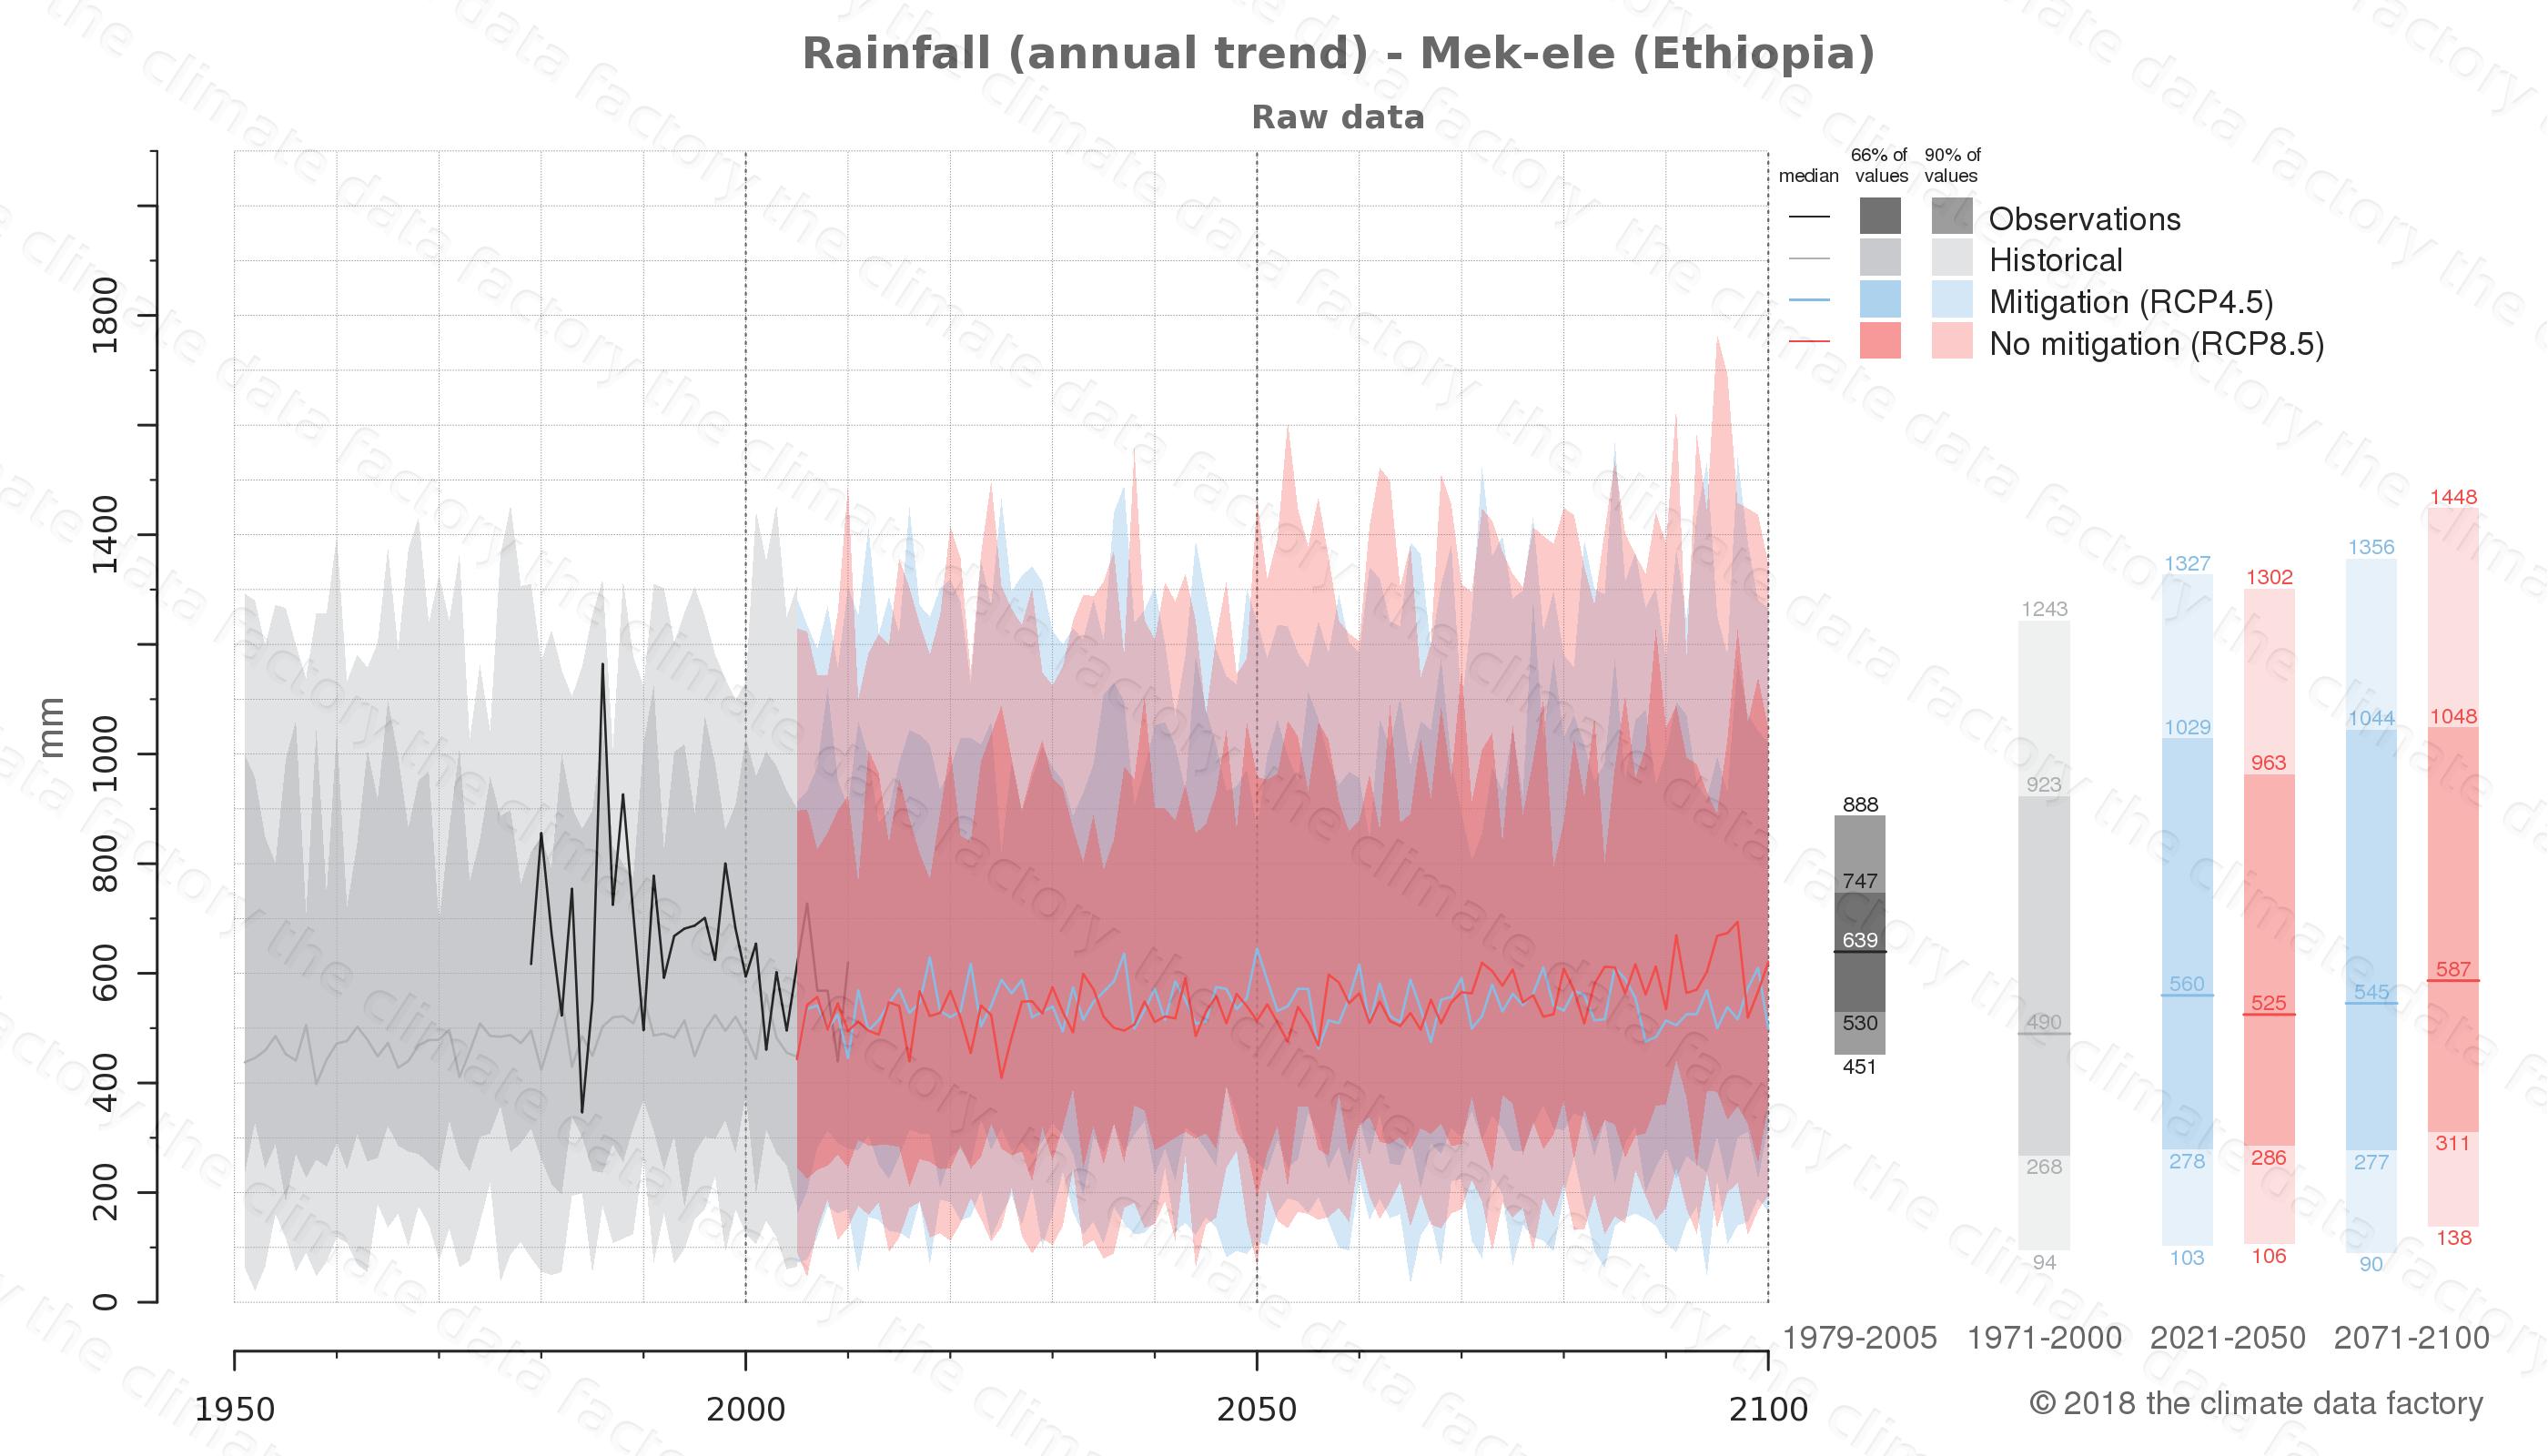 climate change data policy adaptation climate graph city data rainfall mek-ele ethiopia